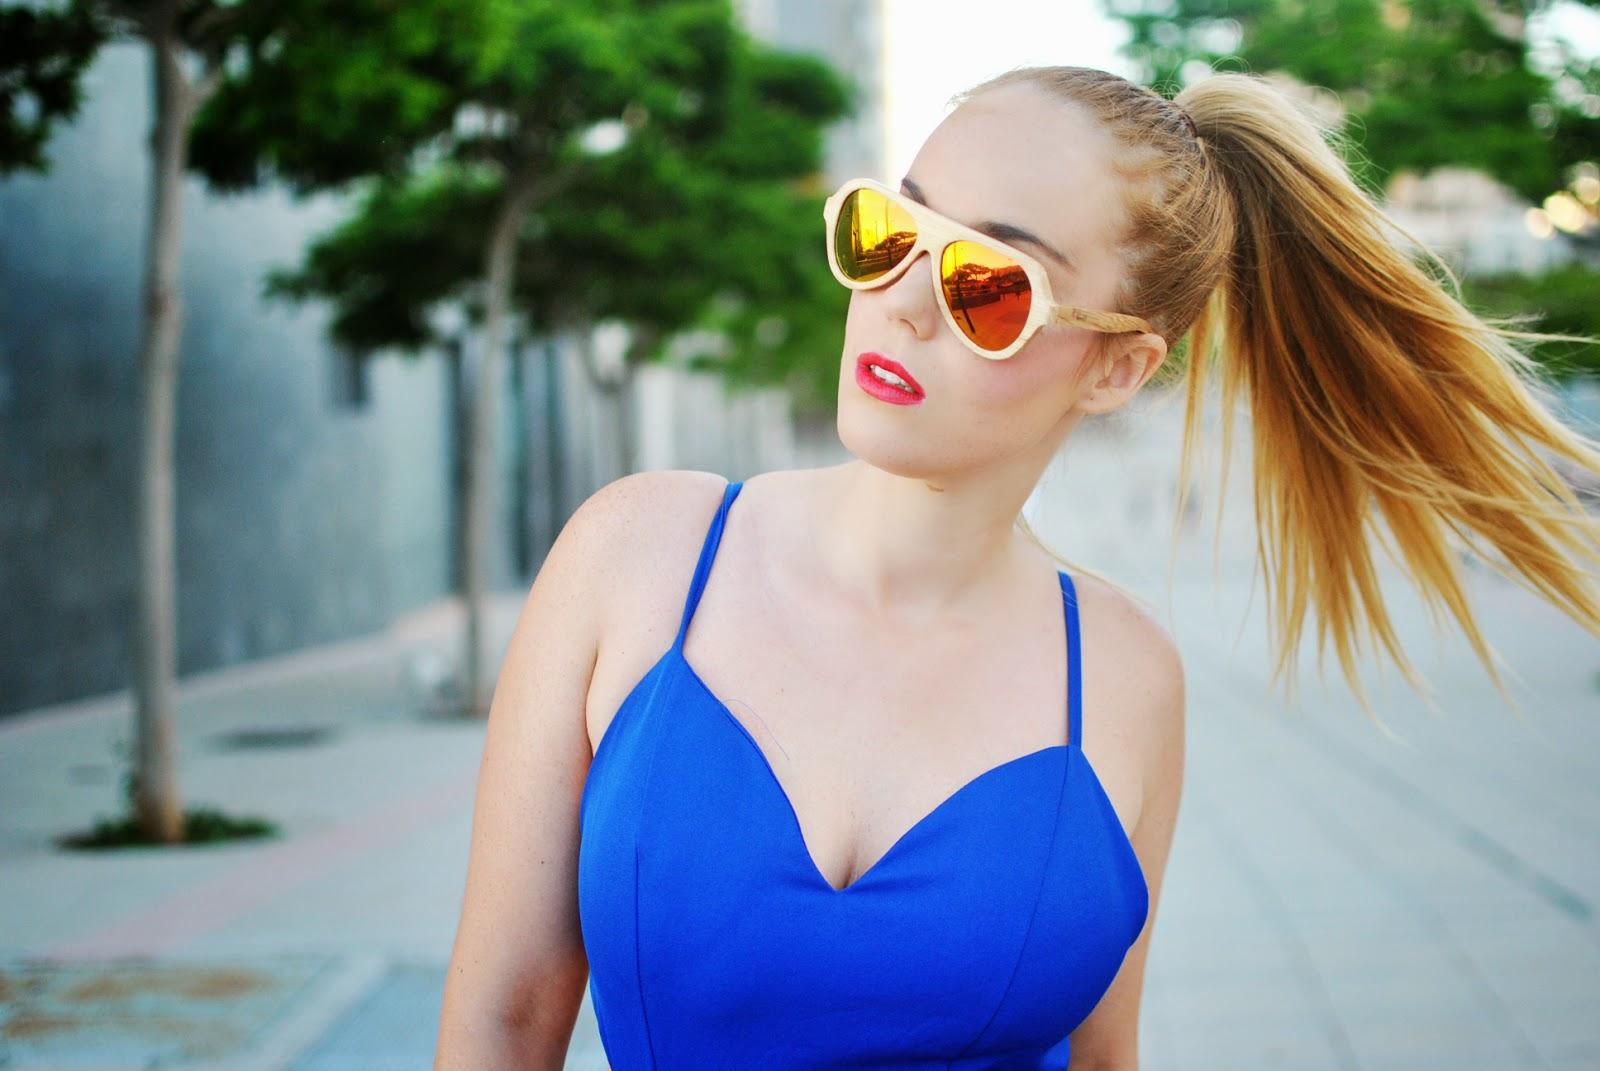 nery hdez, jumpsuits, mono, azul klein, vintagehordes, backless, gafas de espejo, woodwedo